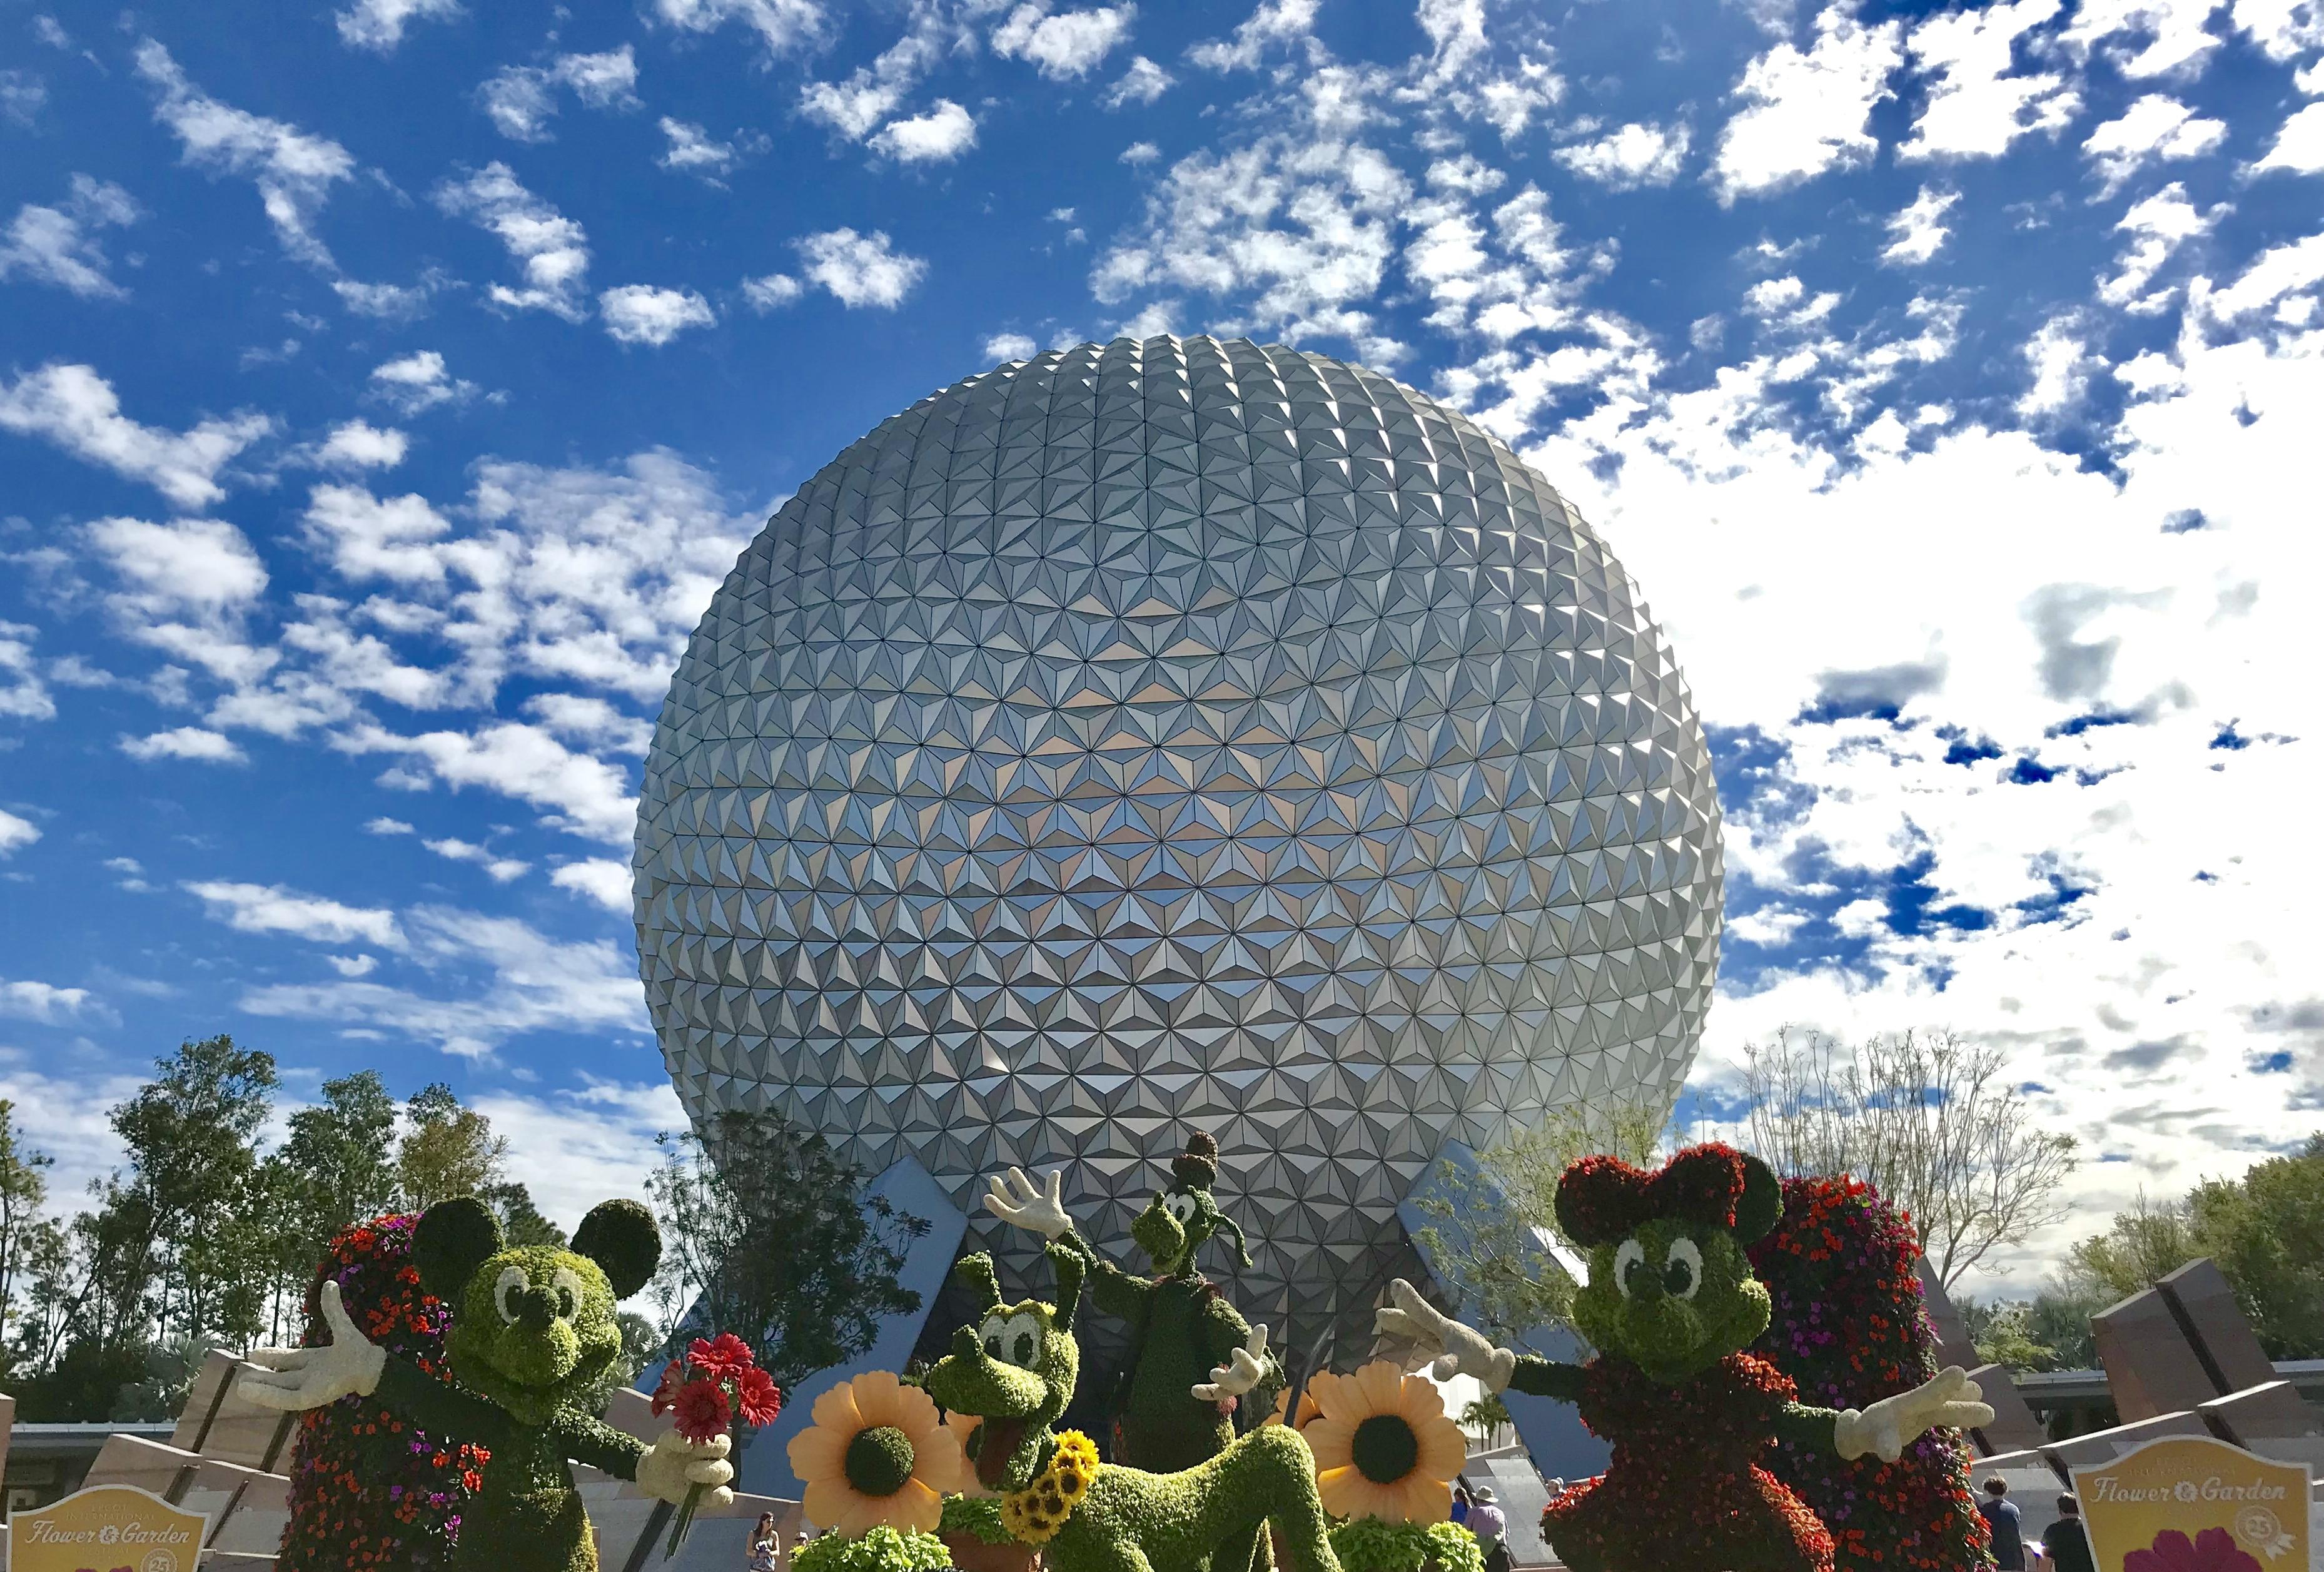 Spaceship Earth at 2018 Flower & Garden Festival